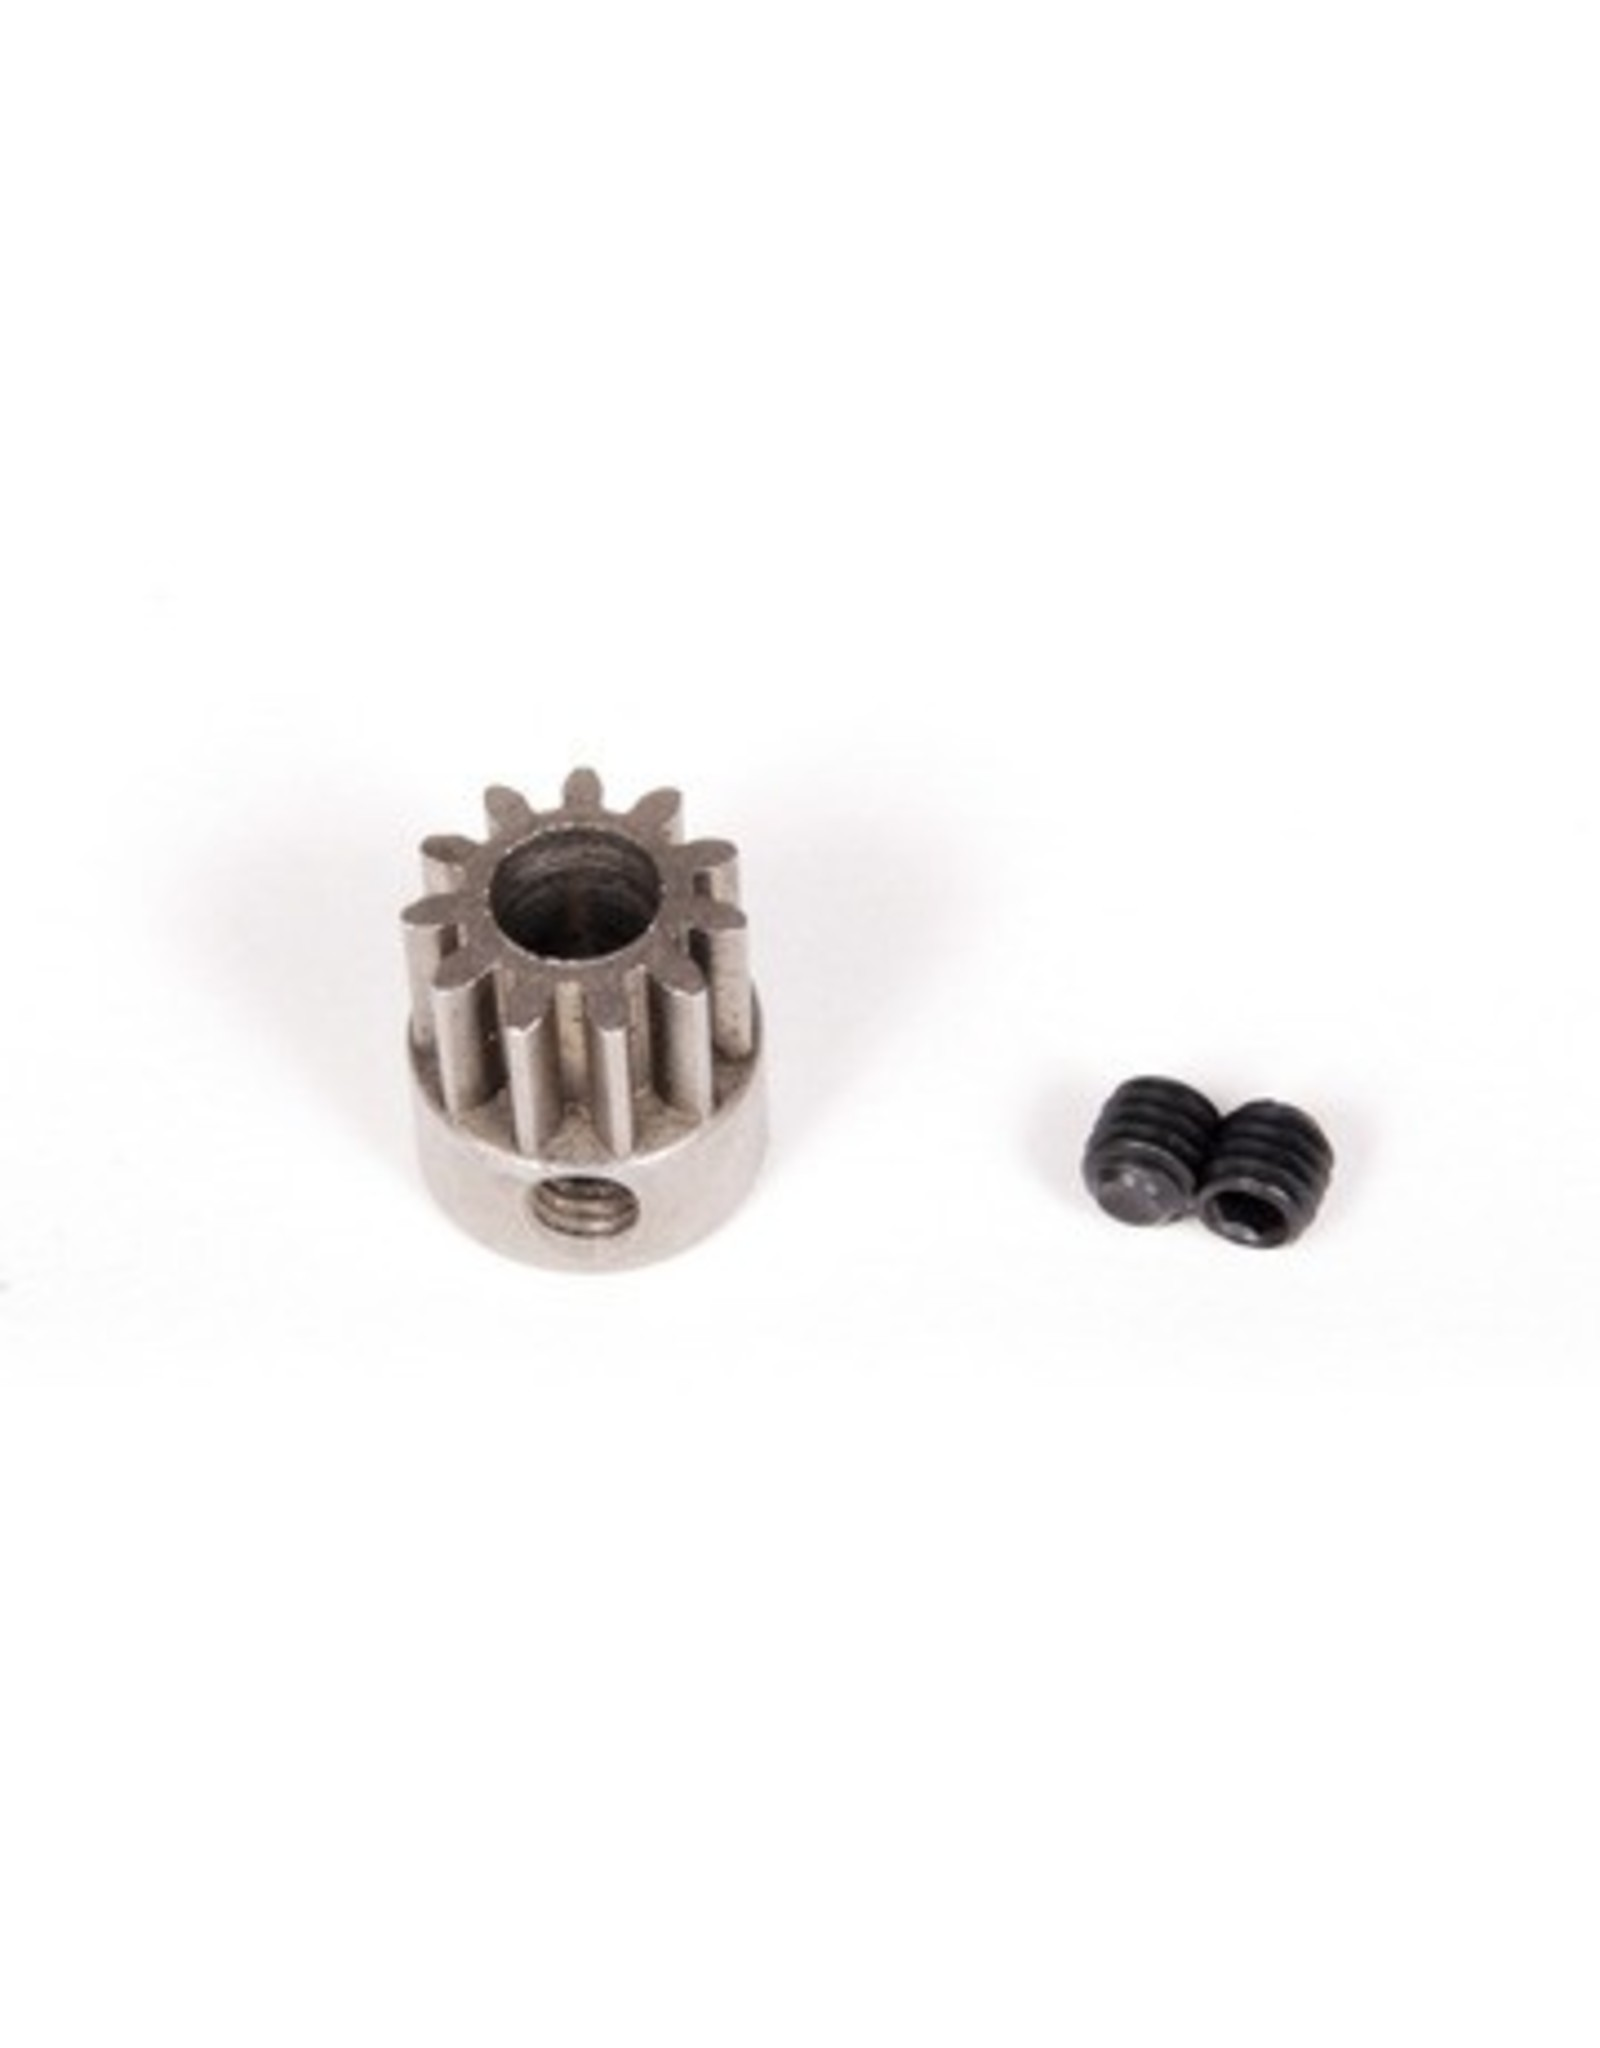 Axial Axial Pinion Gear 32P 11T Steel 5mm Motor Shaft (AX30837)